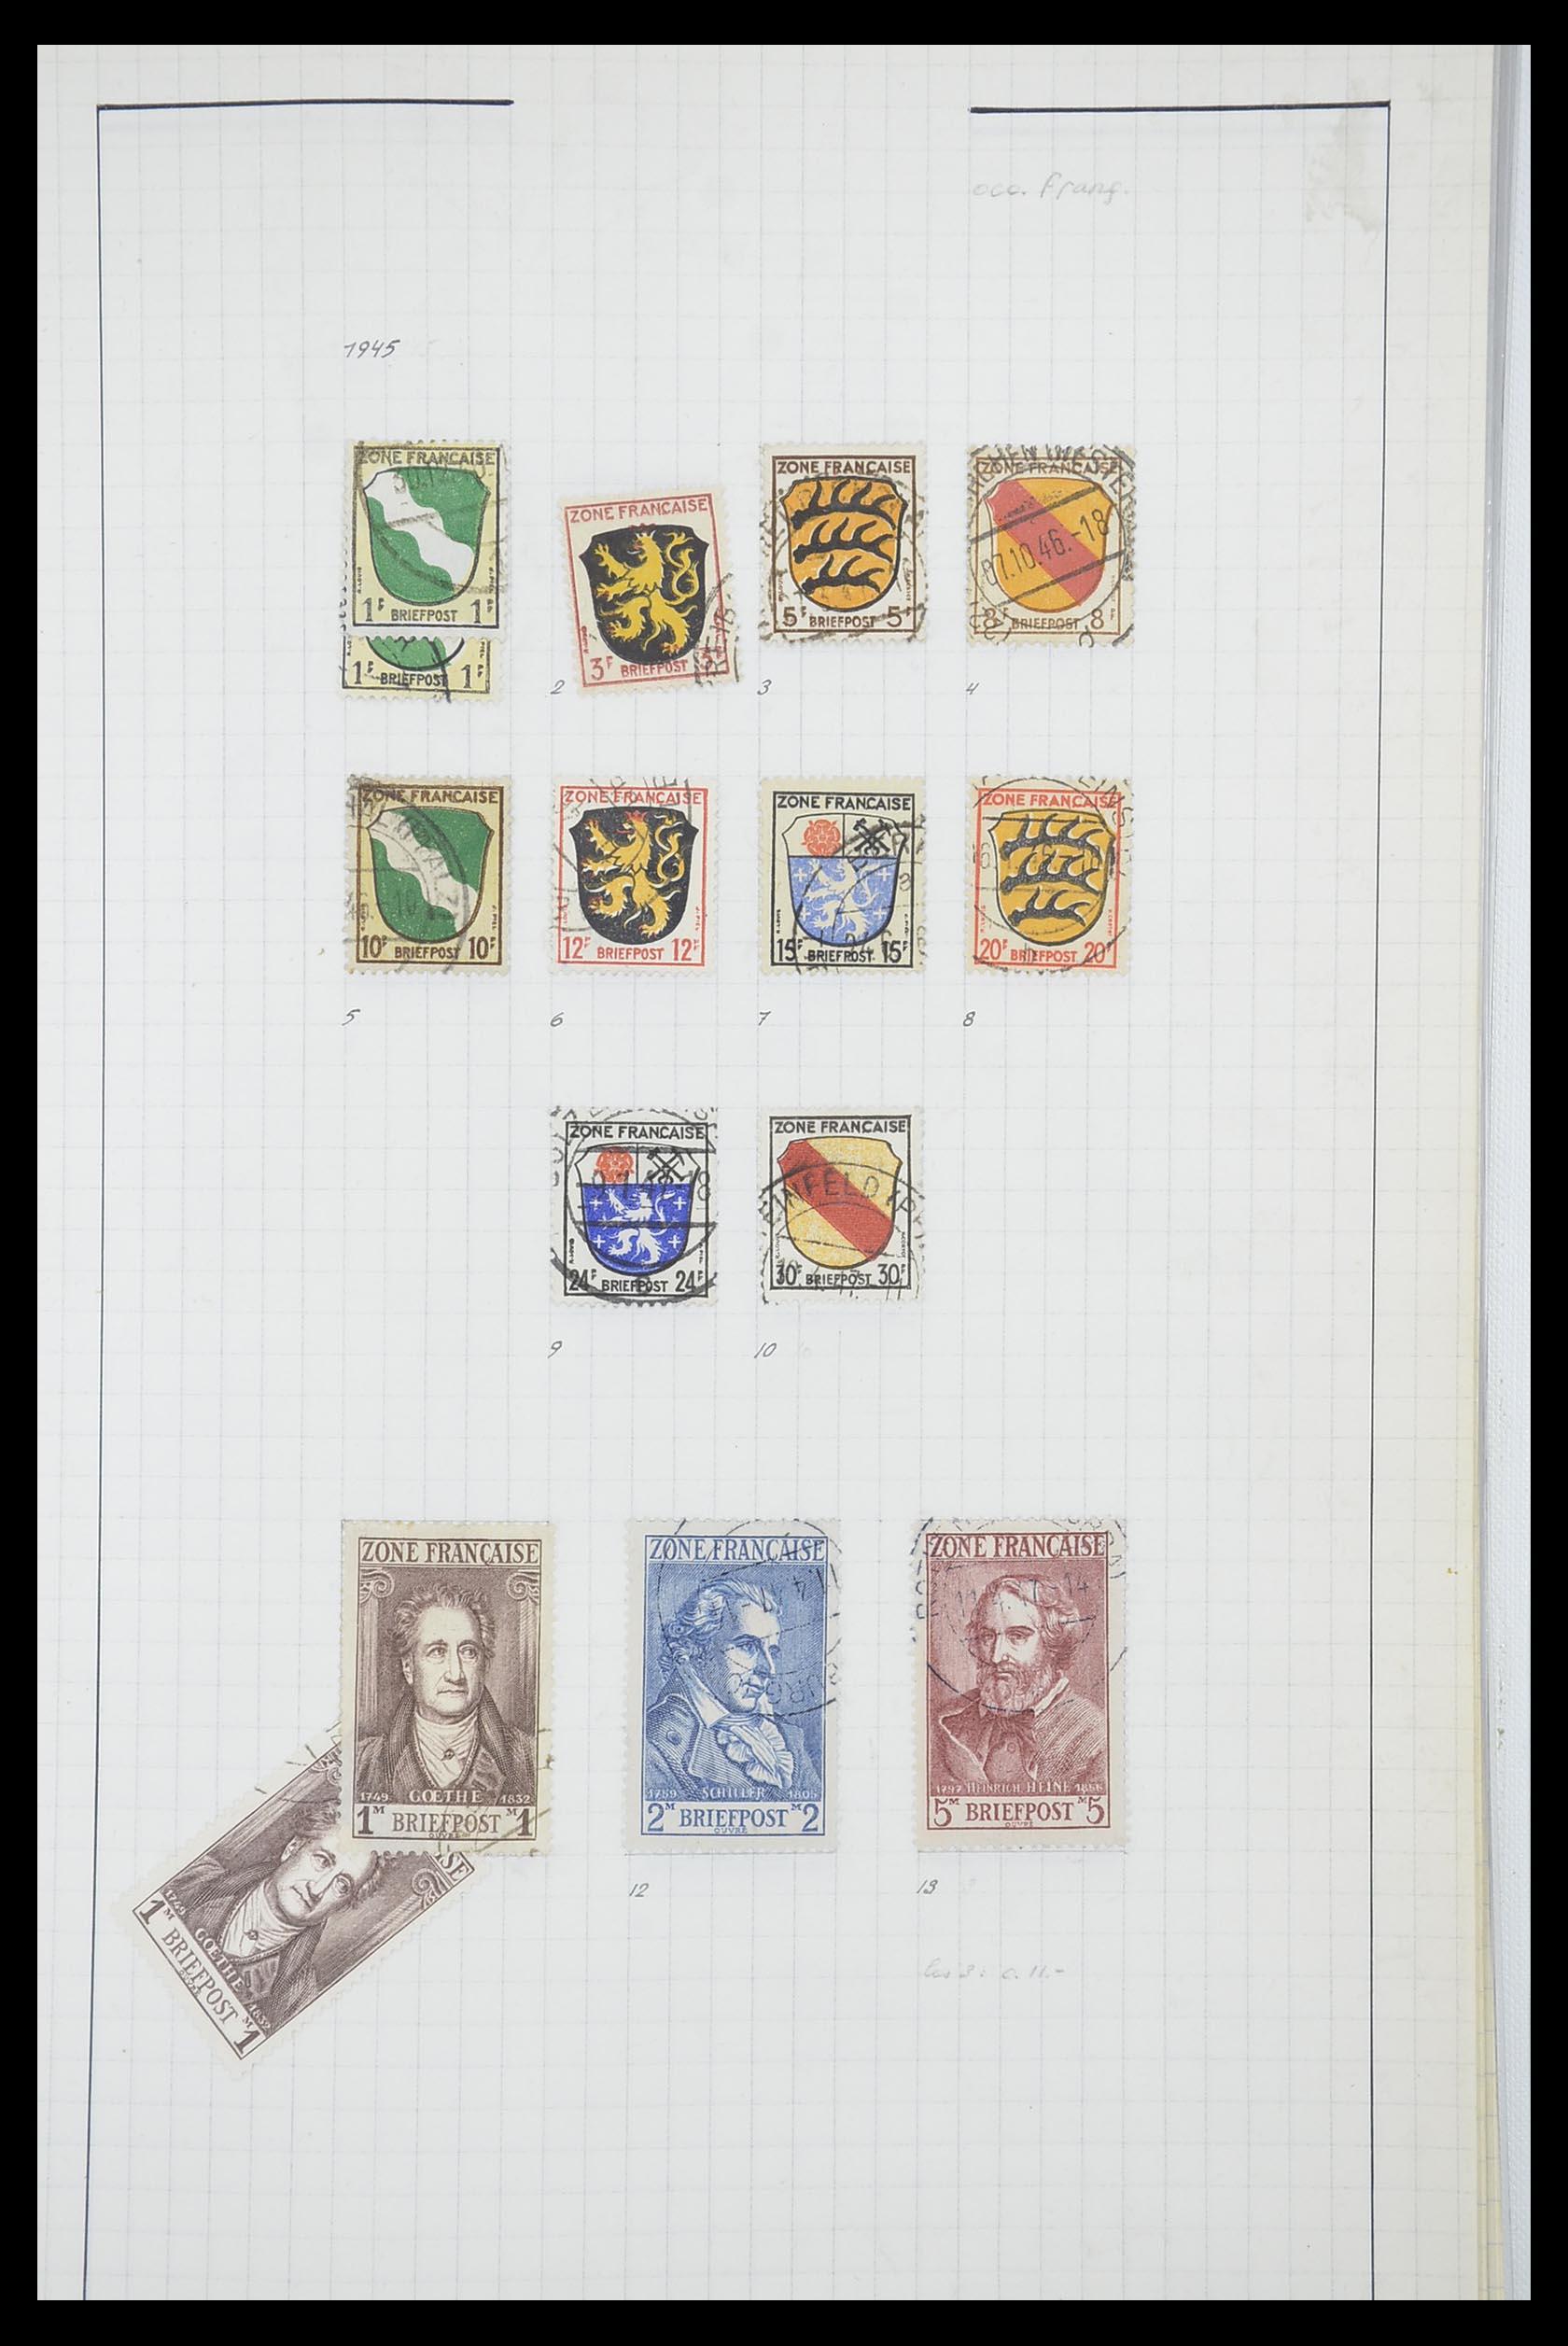 33864 001 - Postzegelverzameling 33864 Franse Zone 1945-1949.